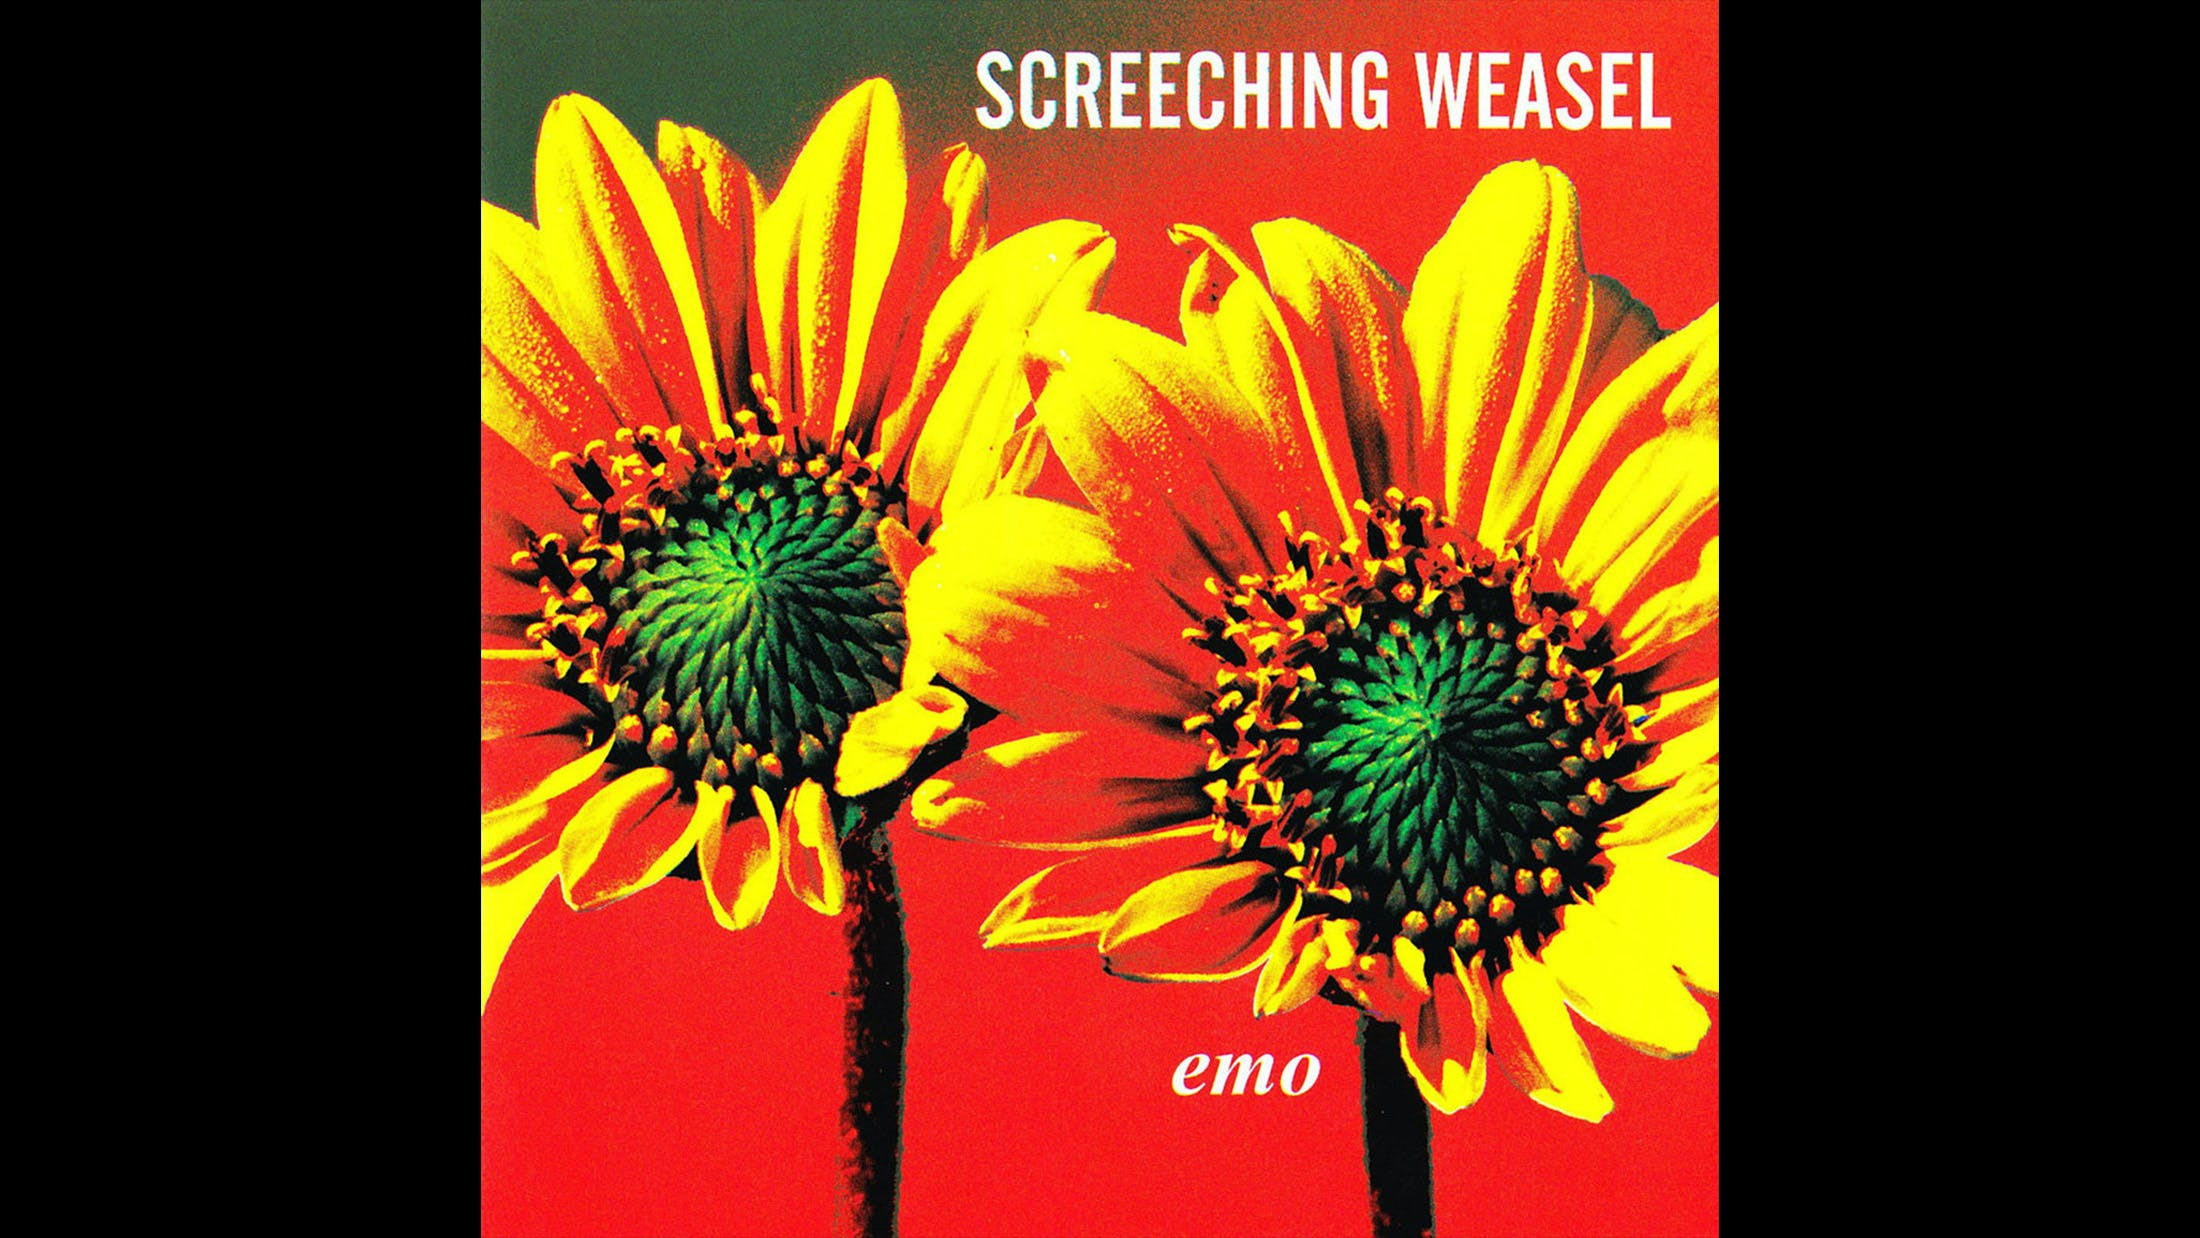 34. Screeching Weasel - Emo (1999)